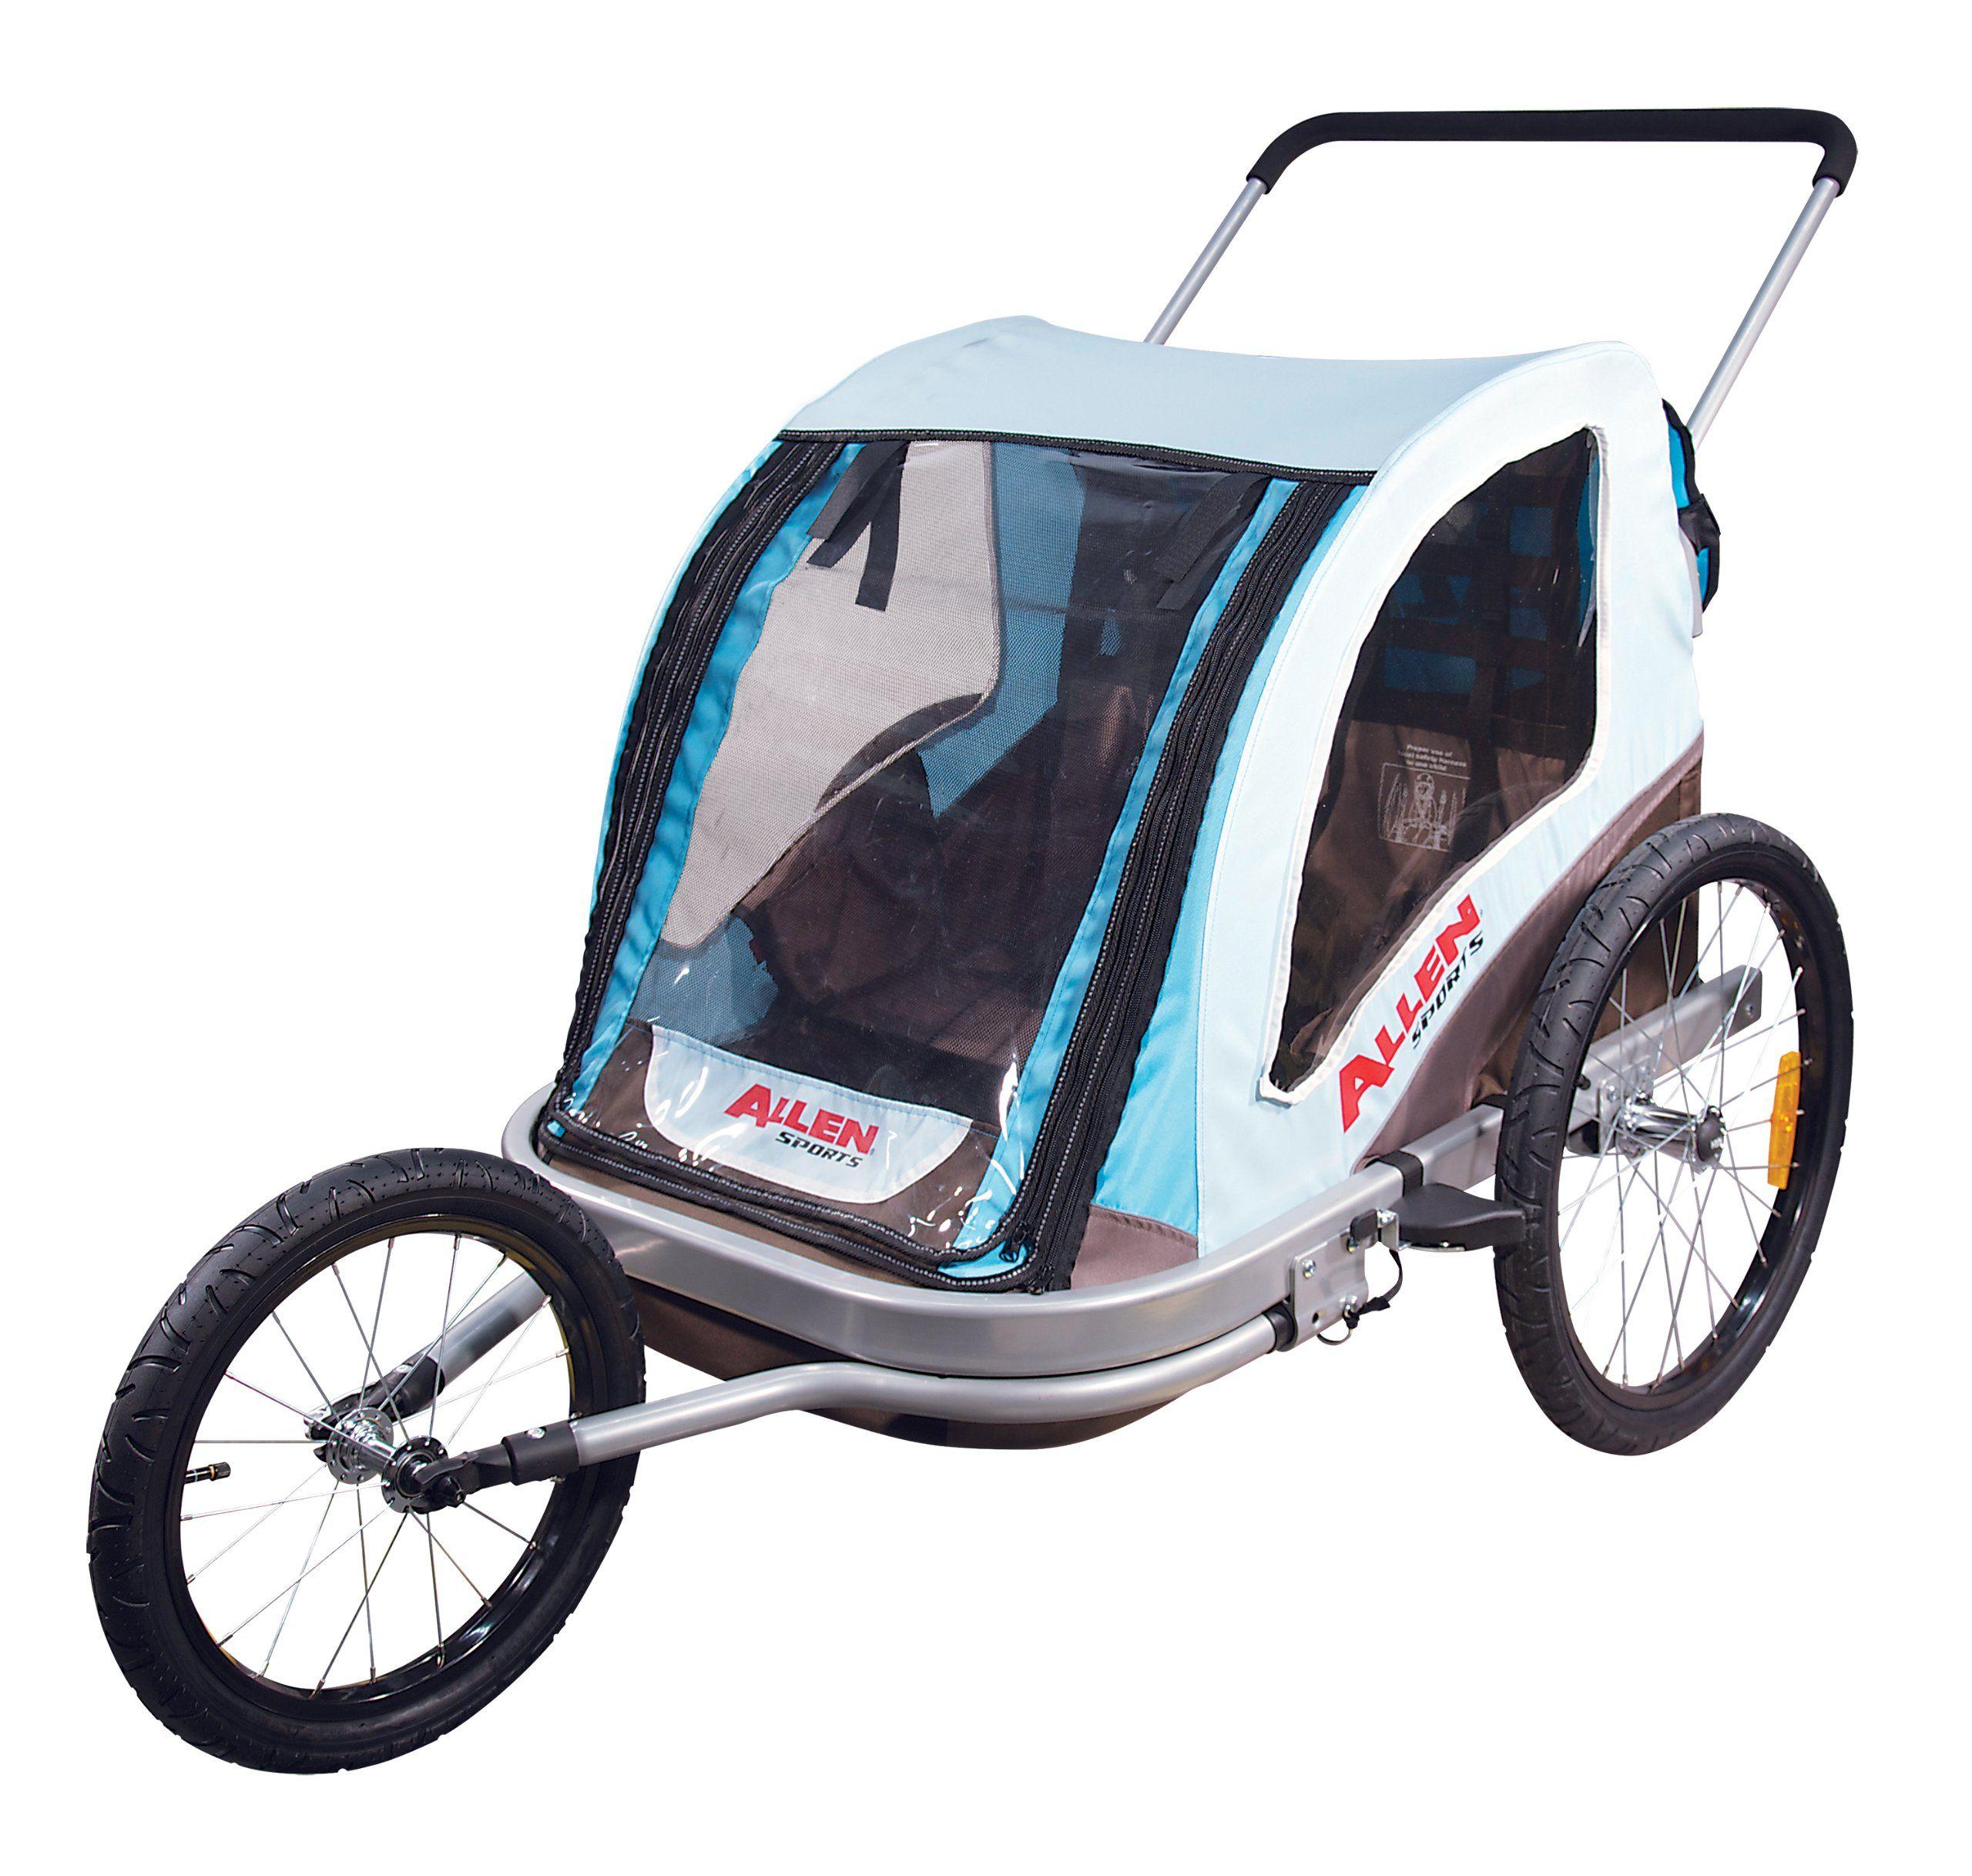 Best Rated Affordable Double Jogging Stroller Bike Trailer Best Rated Affordable Double Jogging Stroller Bike Trailers On Sale Reviews And Ratings Joggi